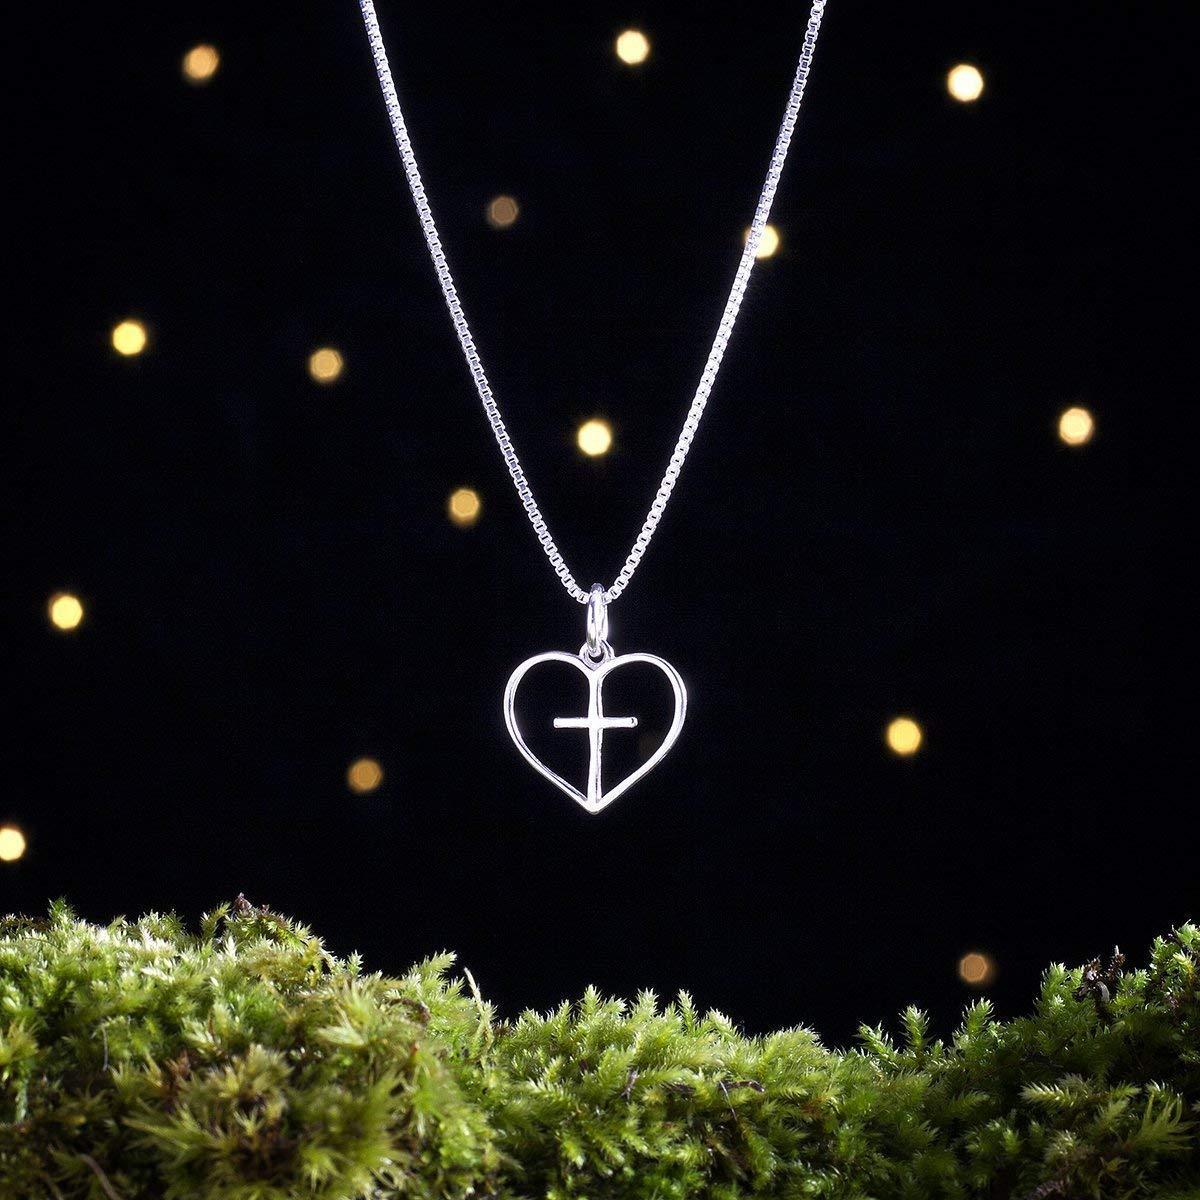 .925 Sterling Silver Heart Cross Charm Pendant